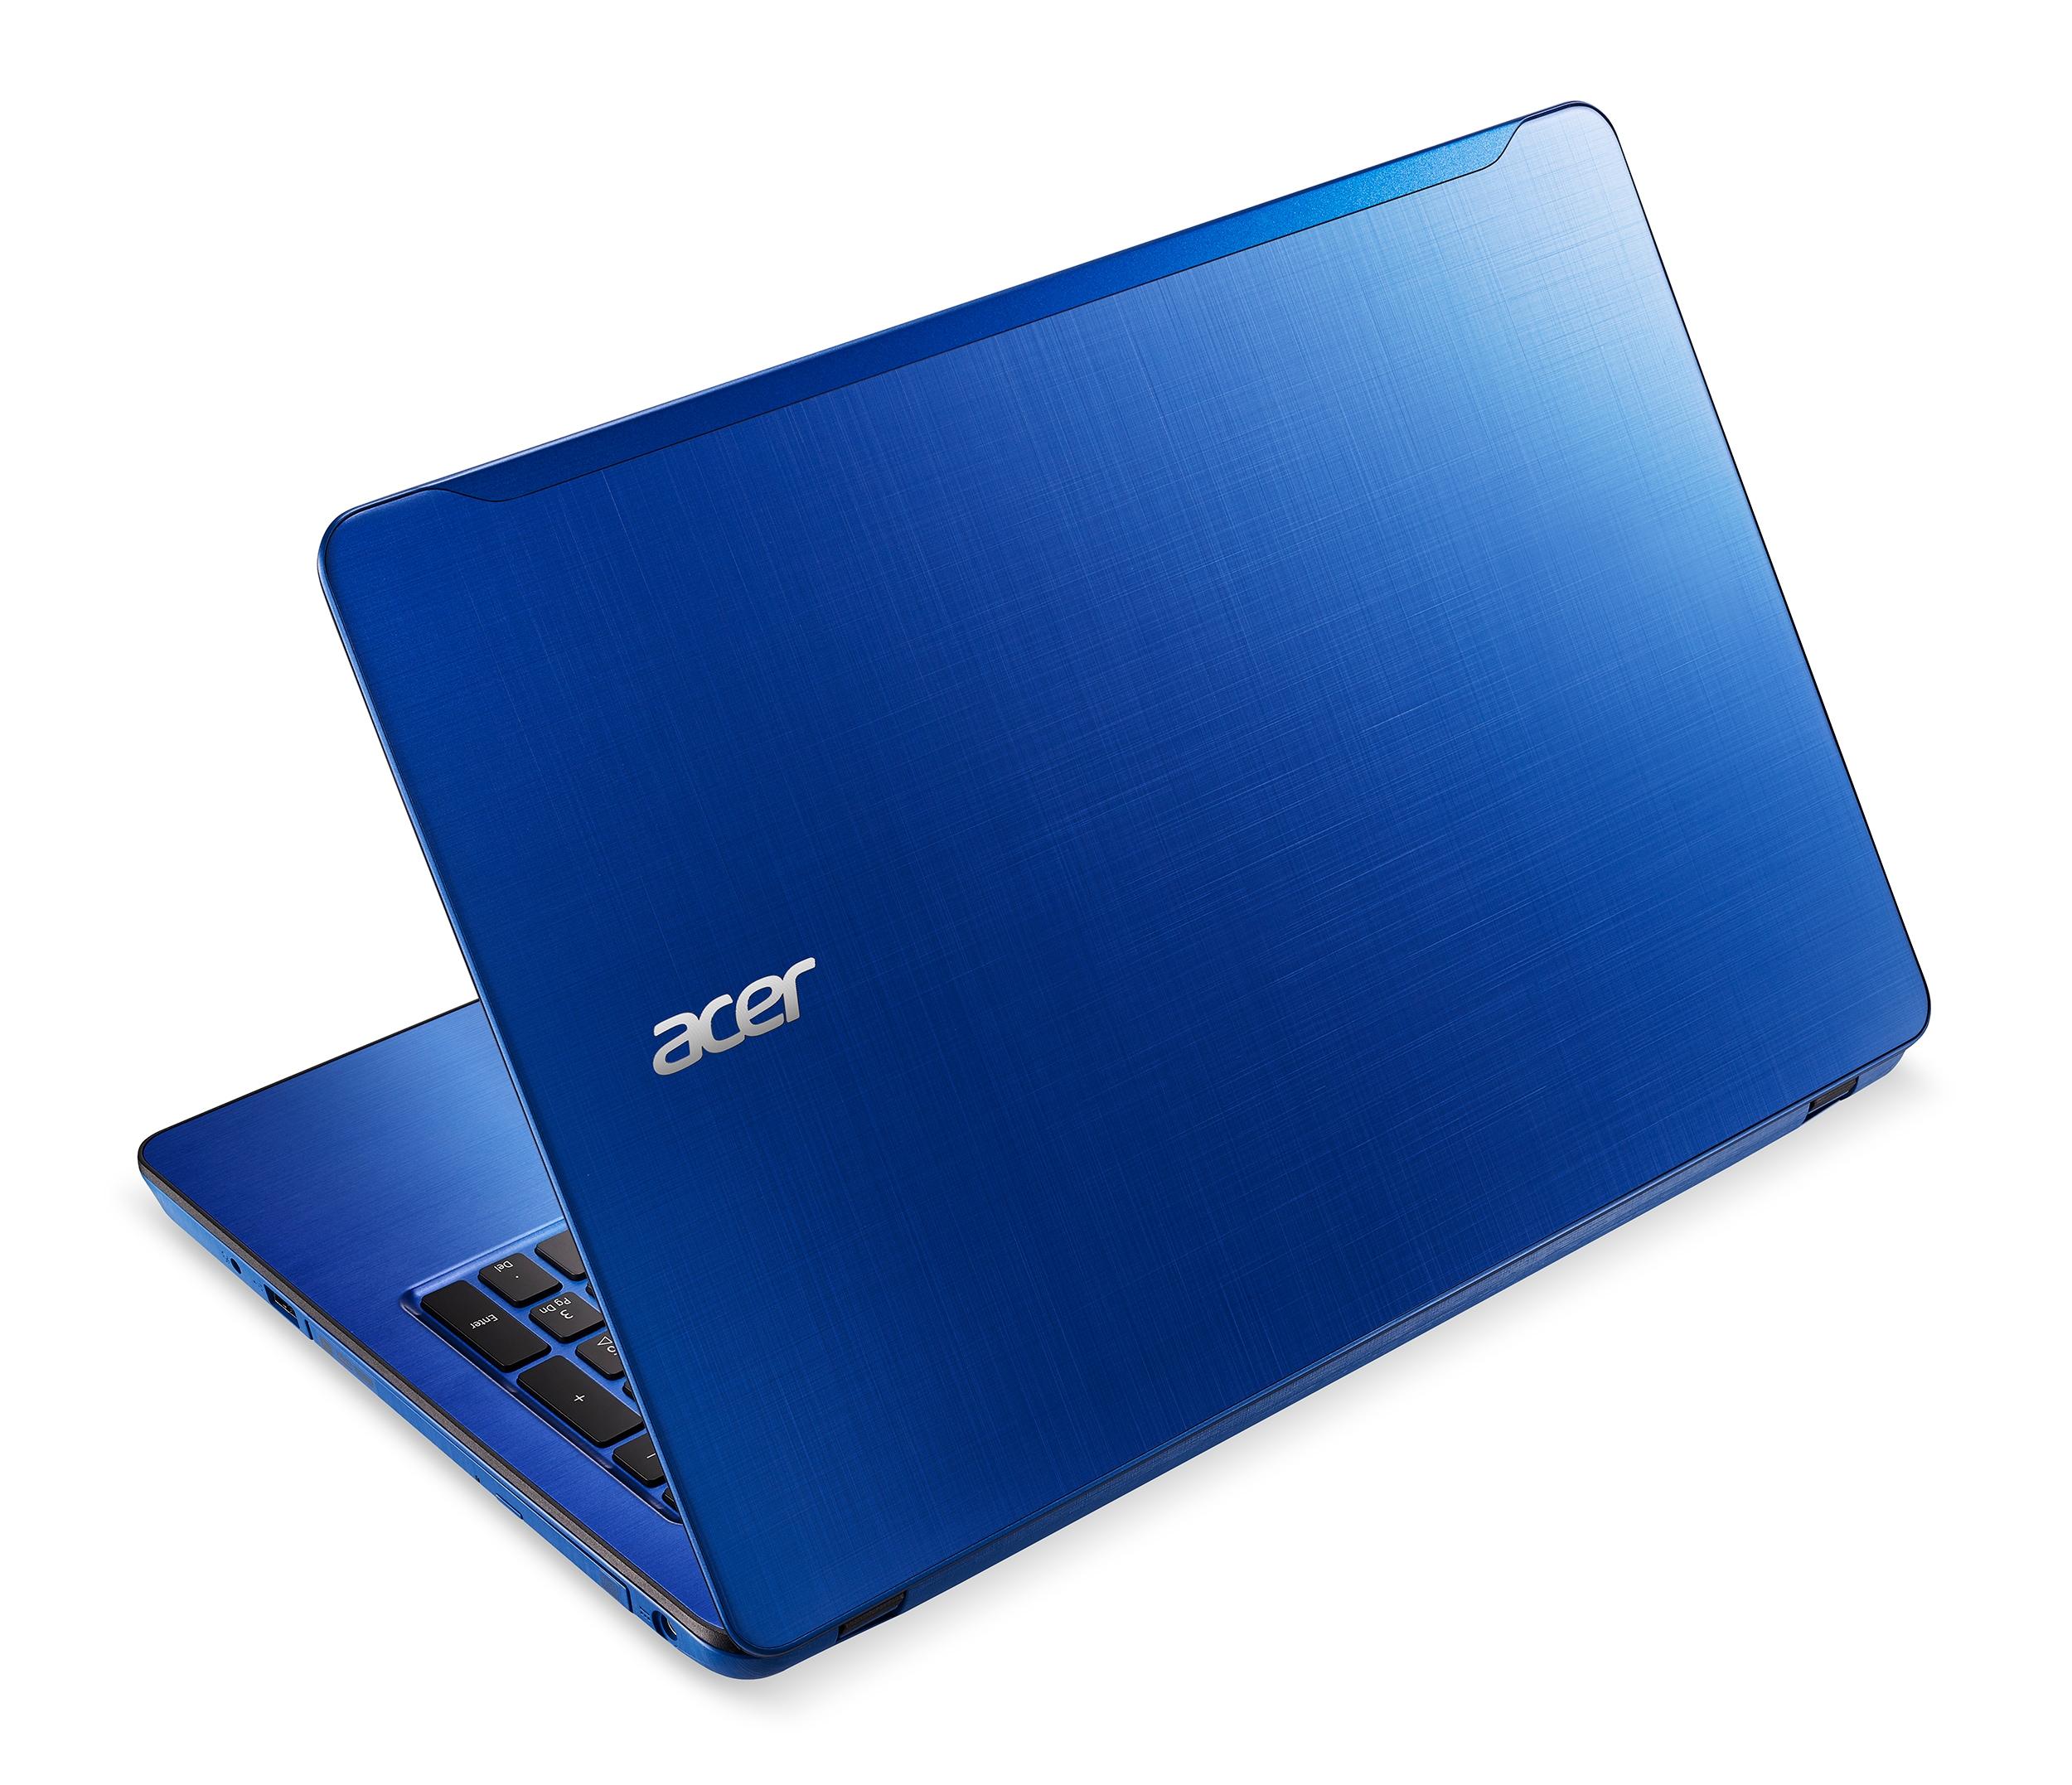 Acer Aspire serie F_1